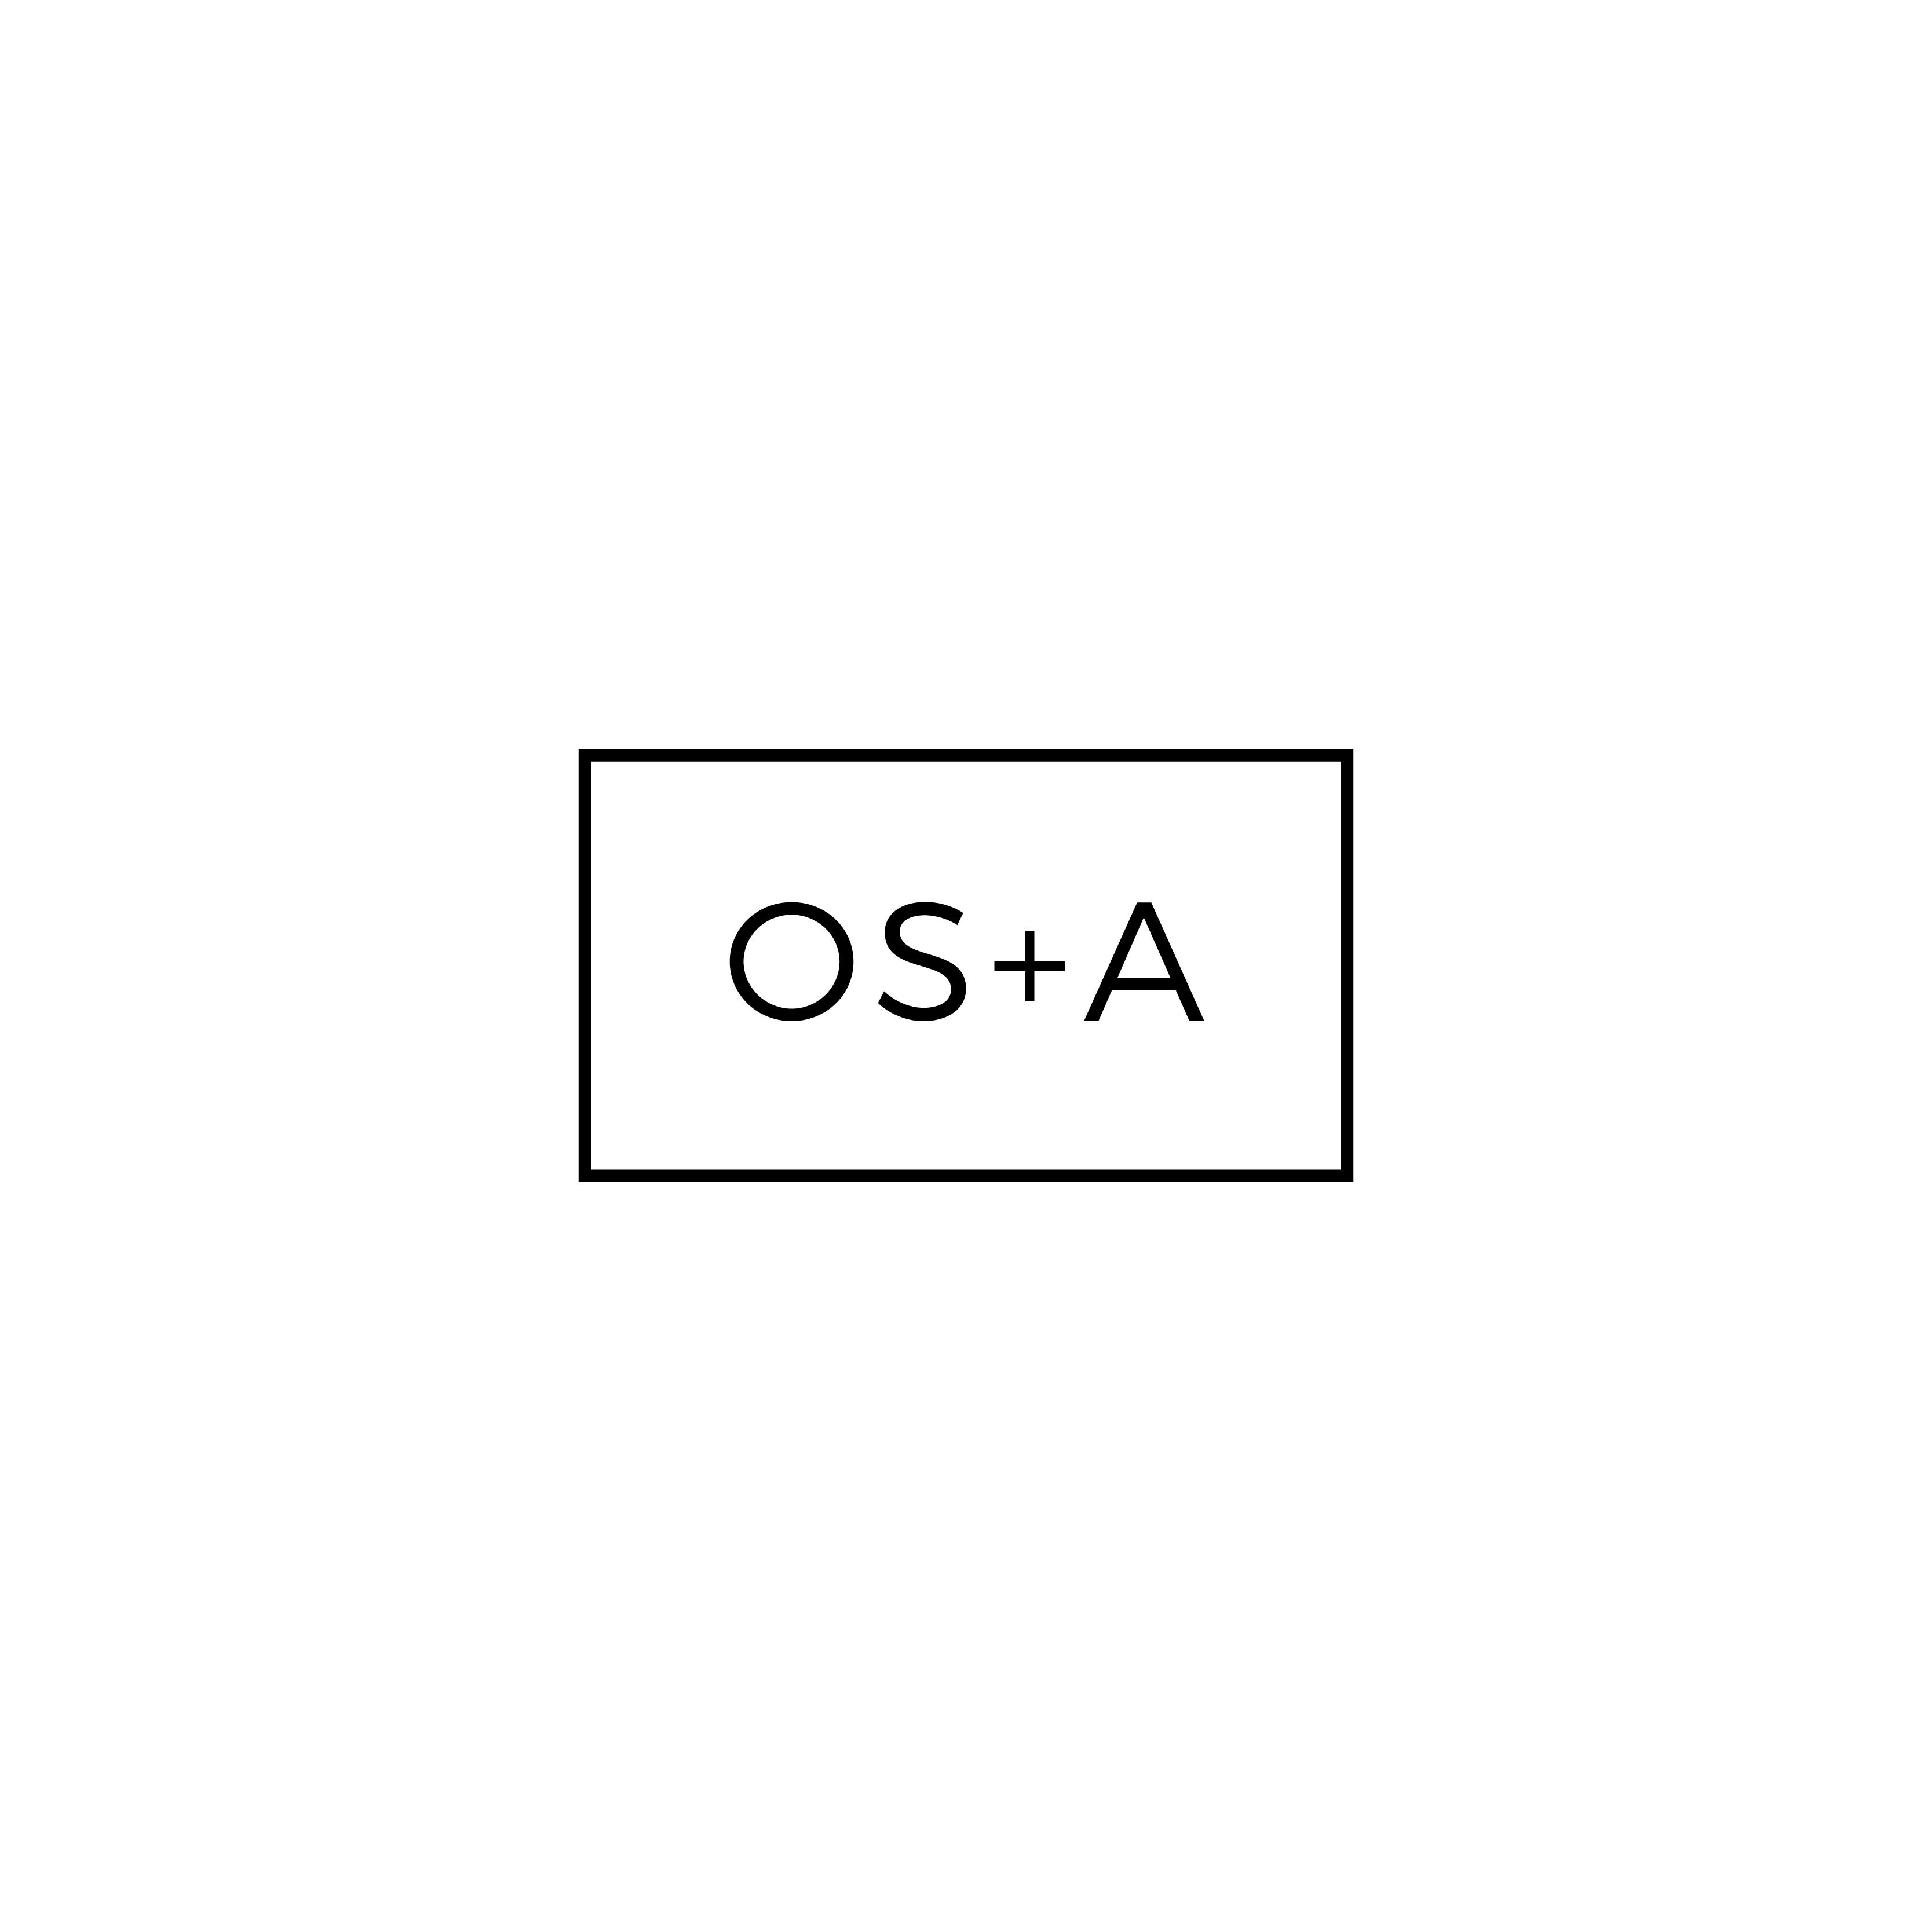 Olson Sanders & Associates - Compass logo